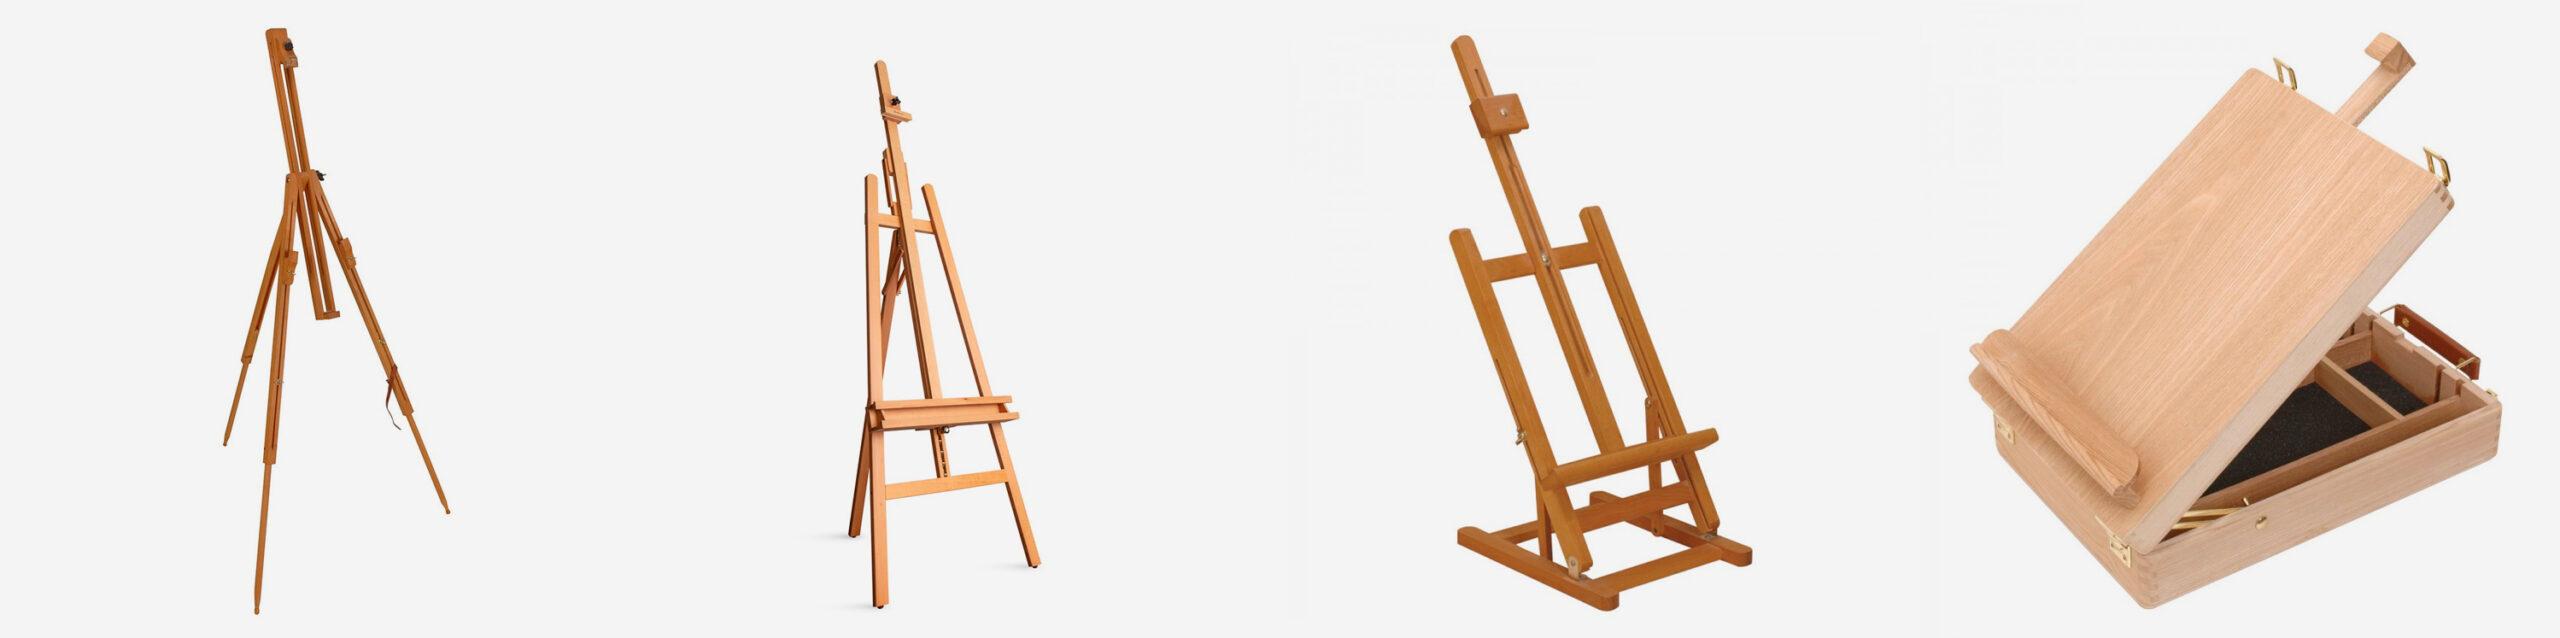 L-R: Jackson's Small Sketching easel, Jackson's A Frame studio easel, Jackson's H Frame Table easel, Jackson's Small Box easel